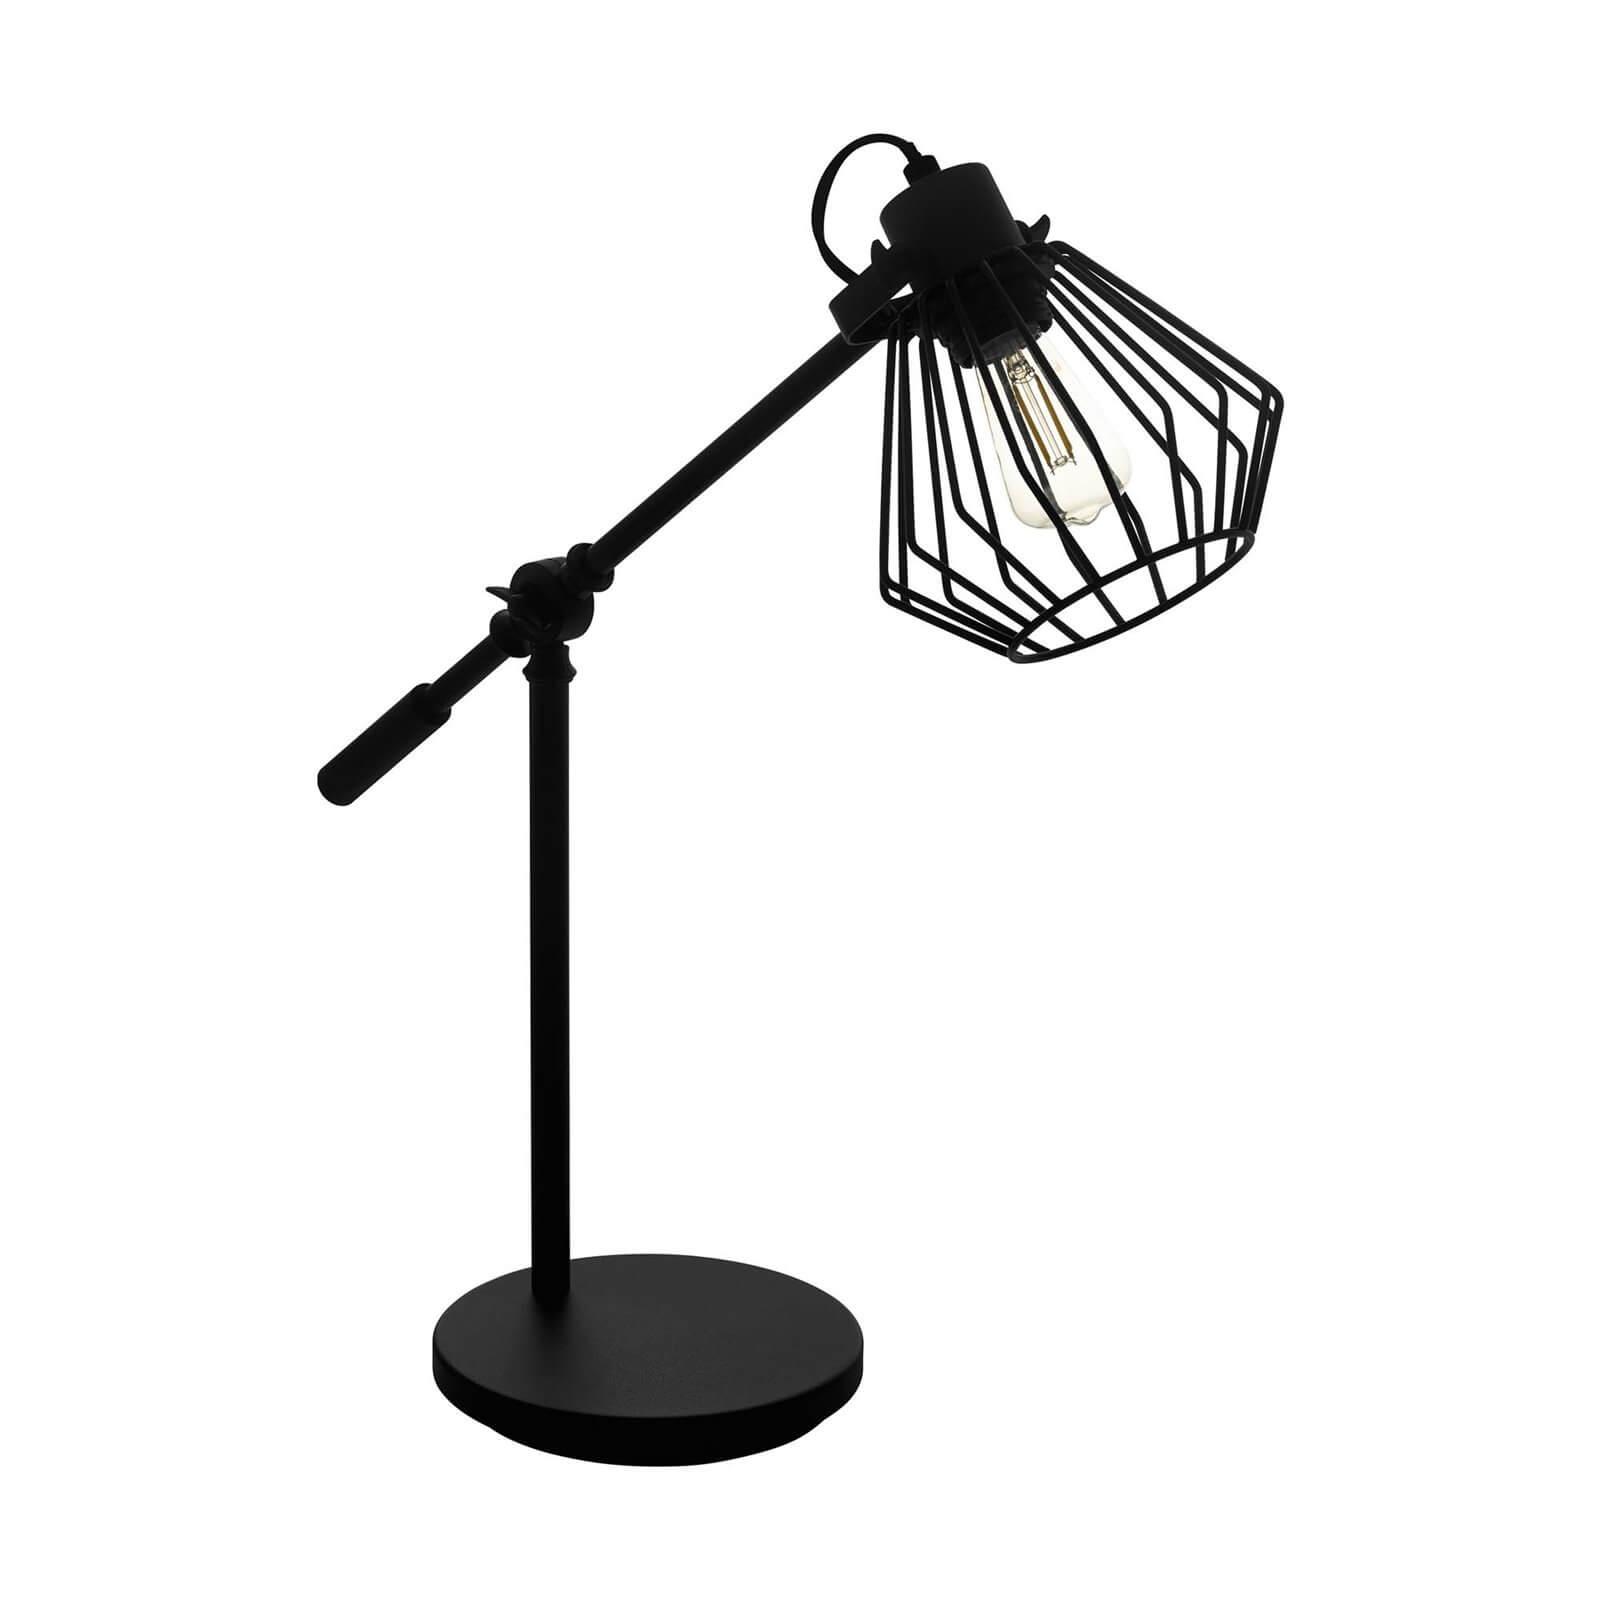 EGLO Tabillano 1 Industrial Black Caged Table Lamp